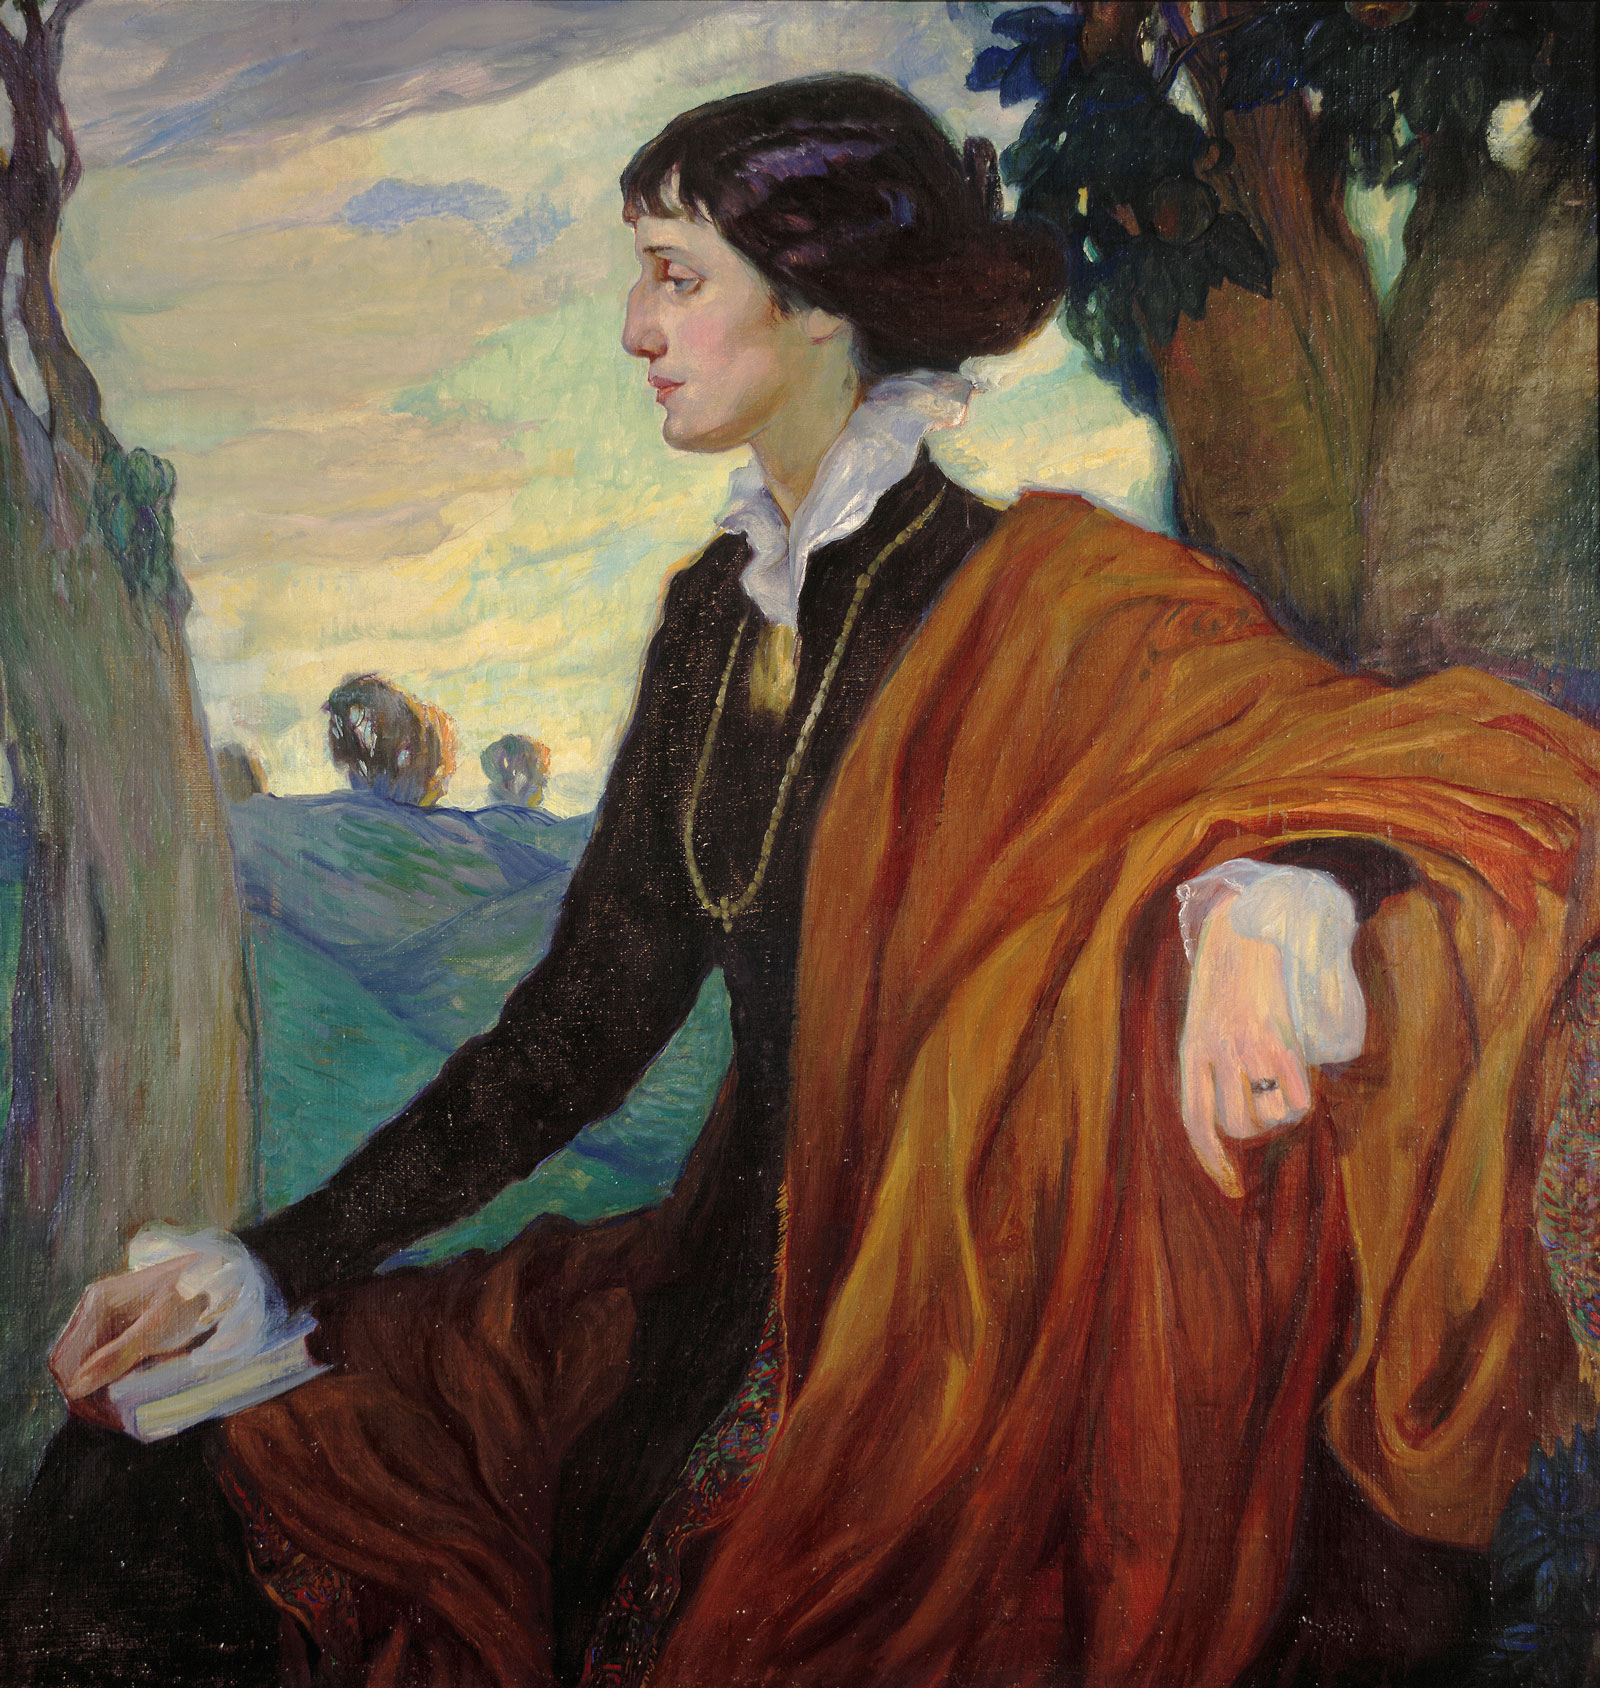 Olga Della-Vos-Kardovskaia: Anna Akhmatova, 1914